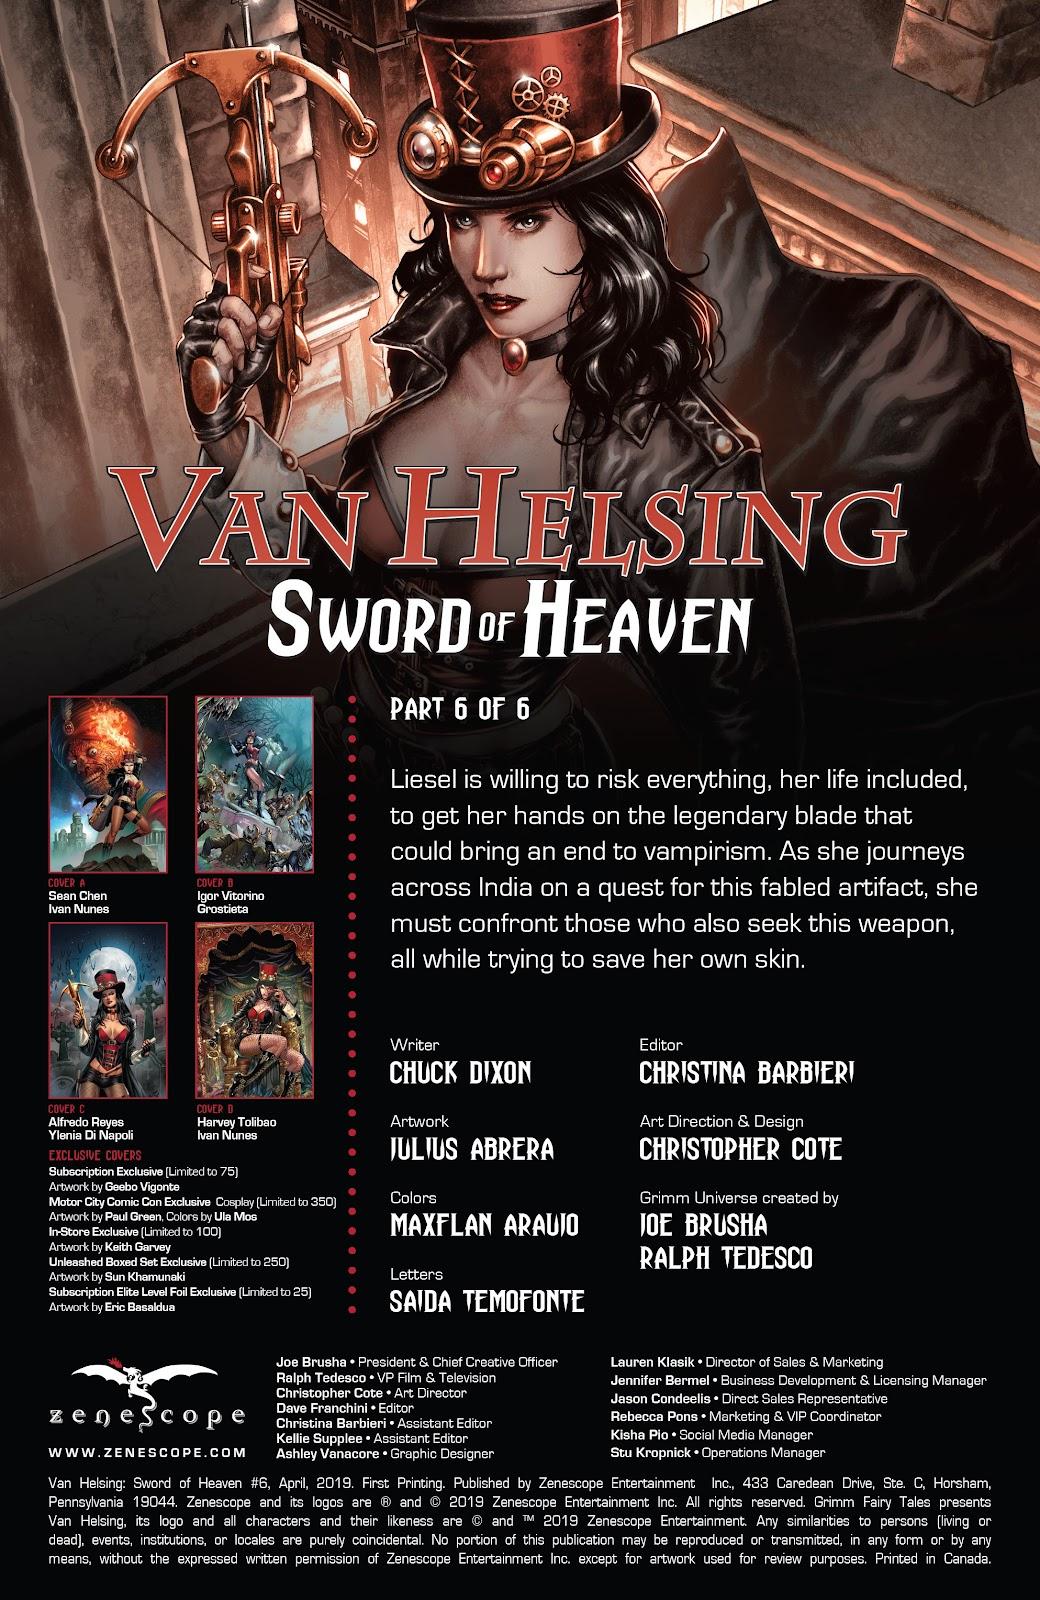 Read online Van Helsing: Sword of Heaven comic -  Issue #6 - 2